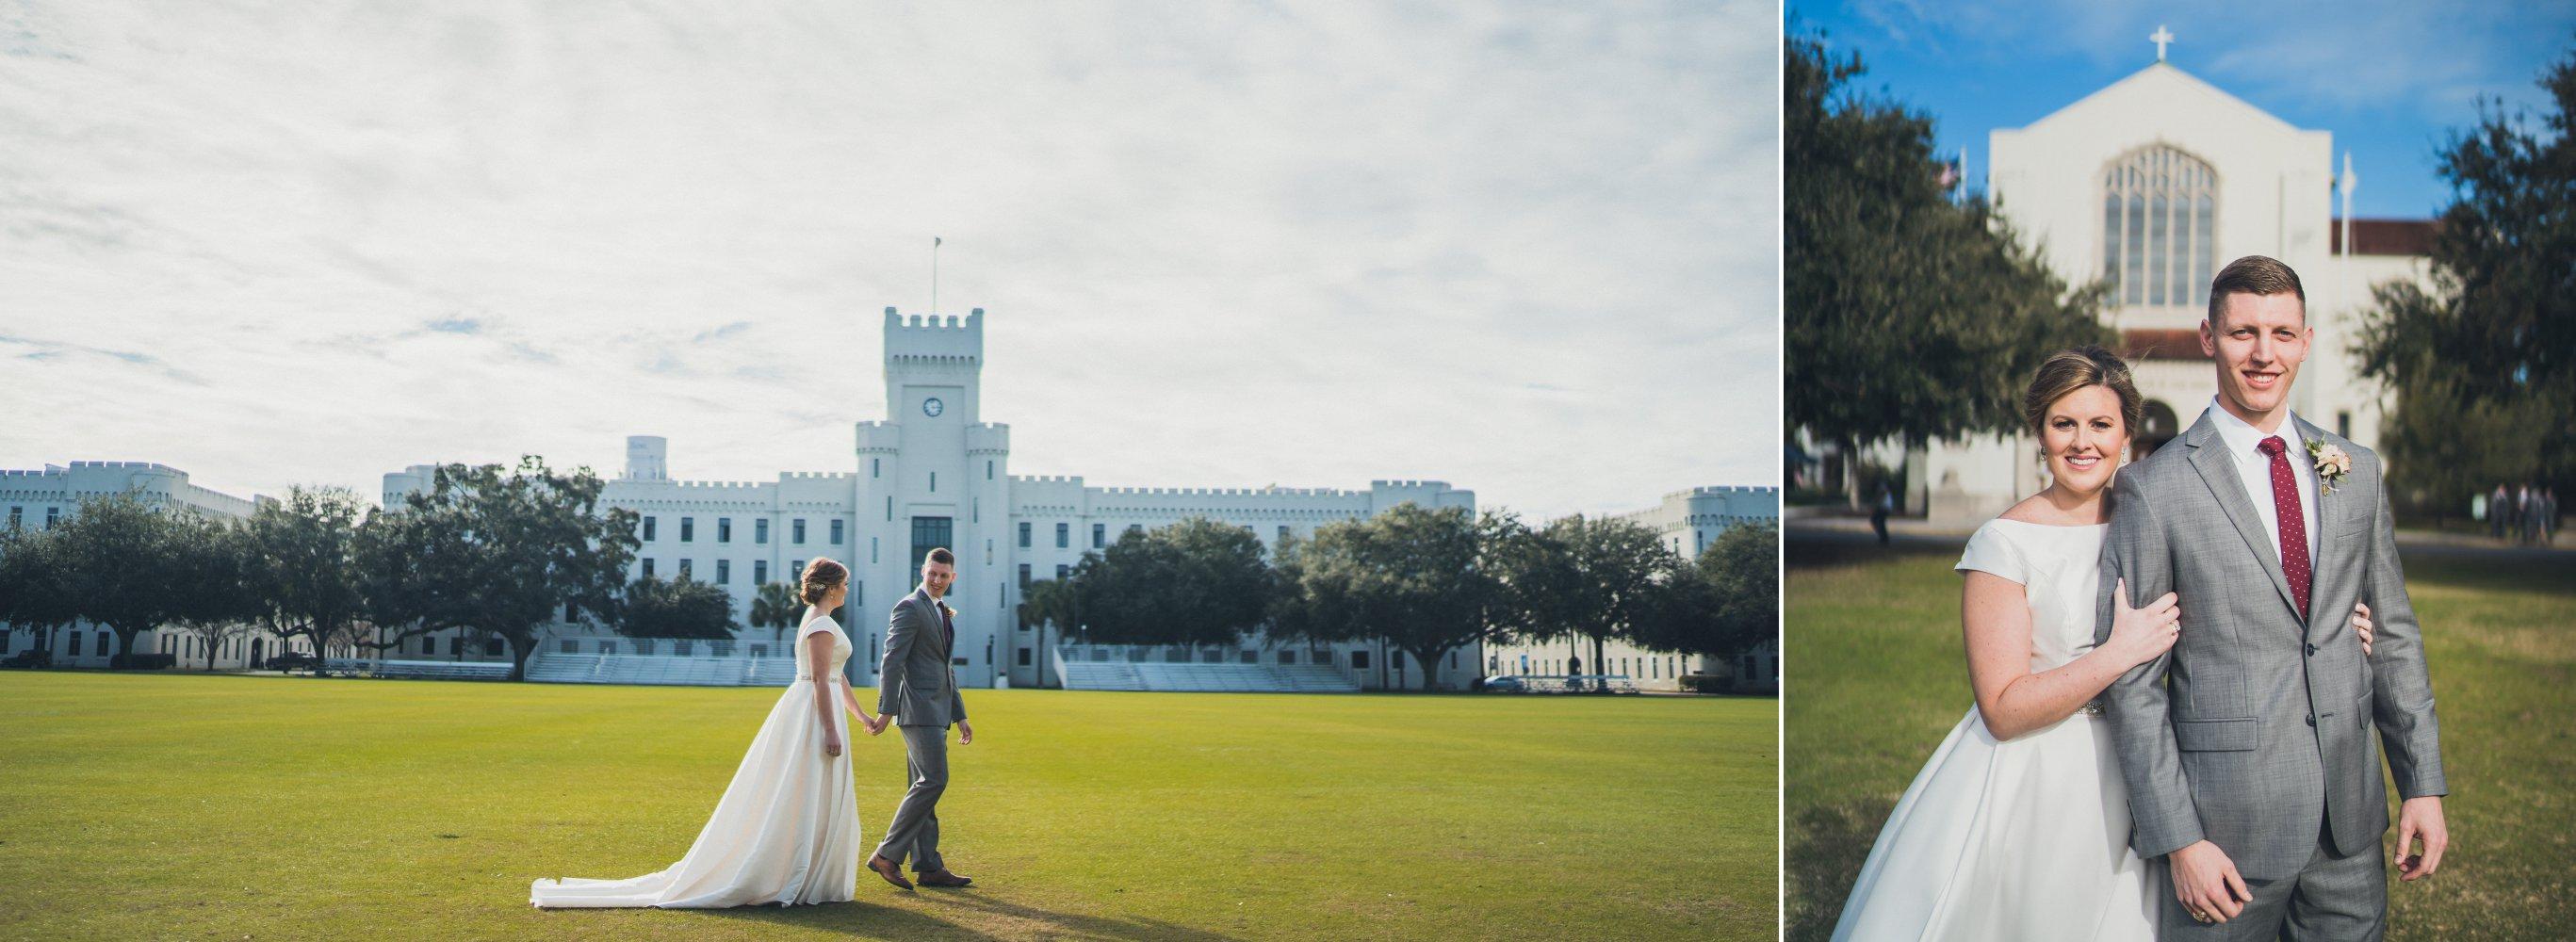 The Citadel Wedding